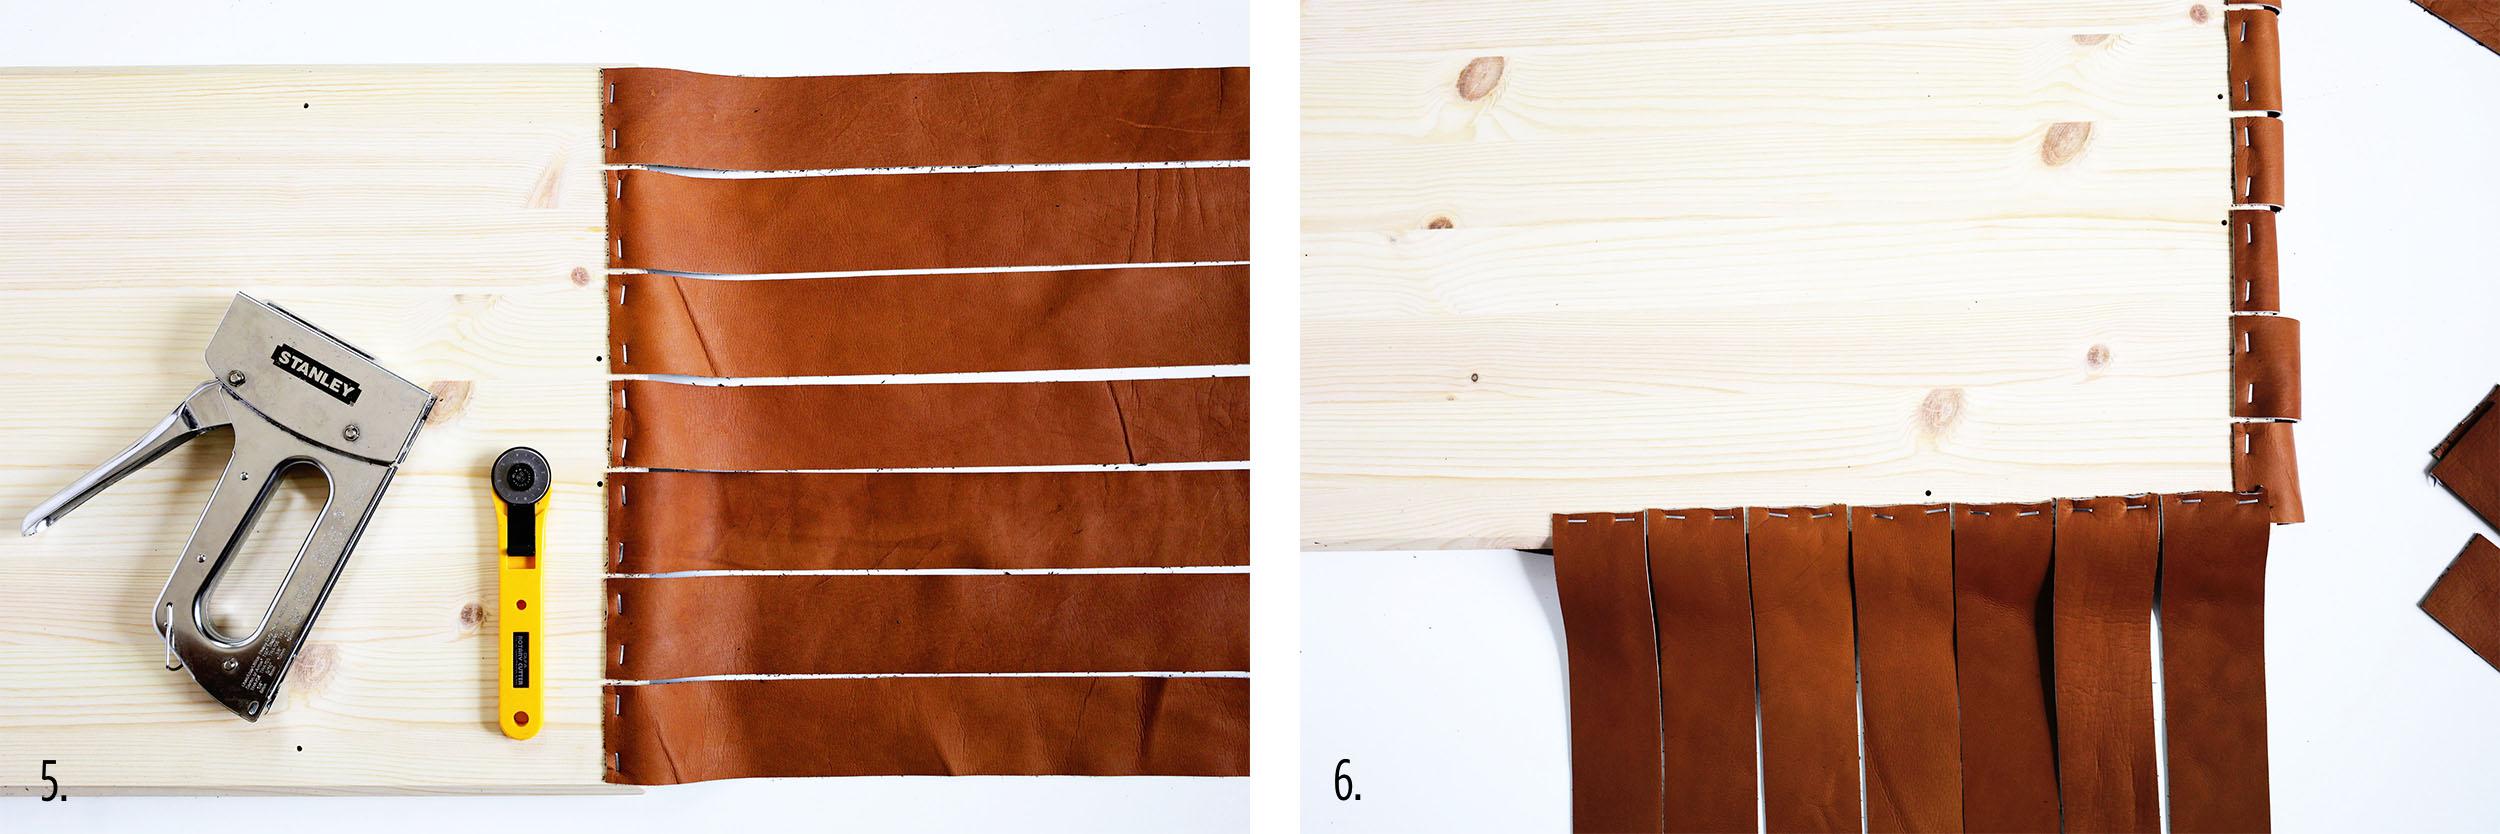 Steps5-6